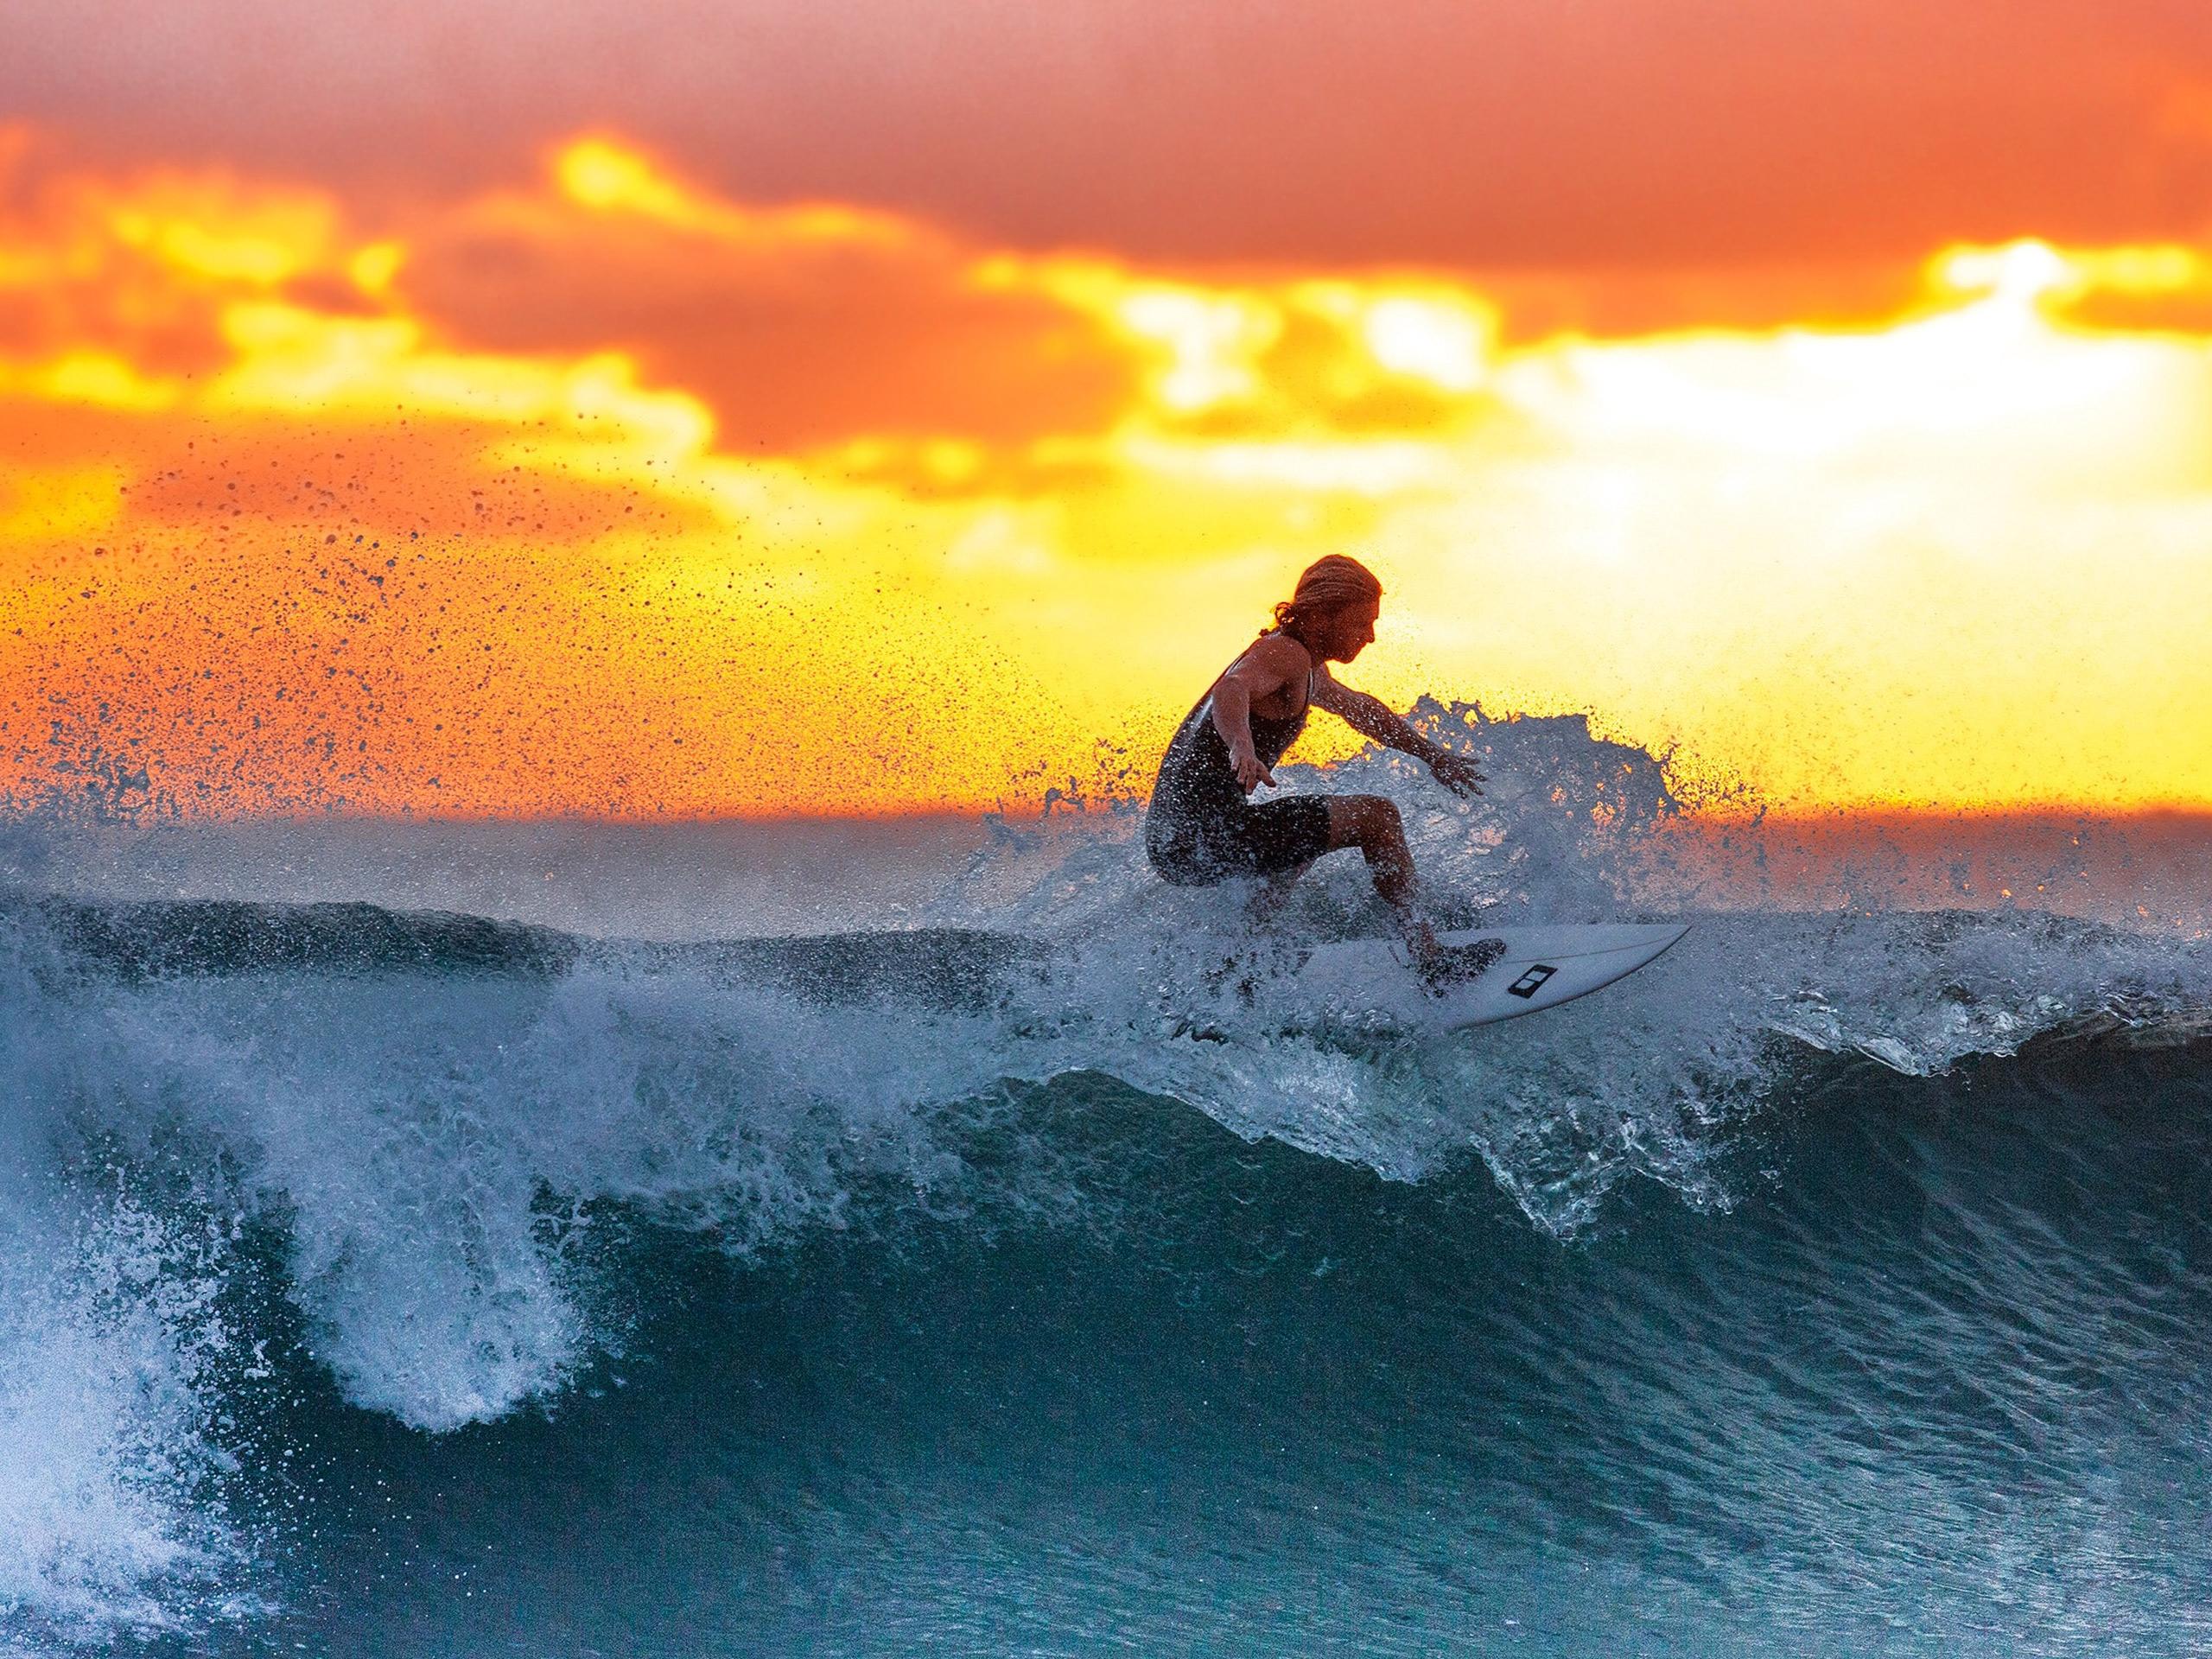 Sunset surfing in Tofino